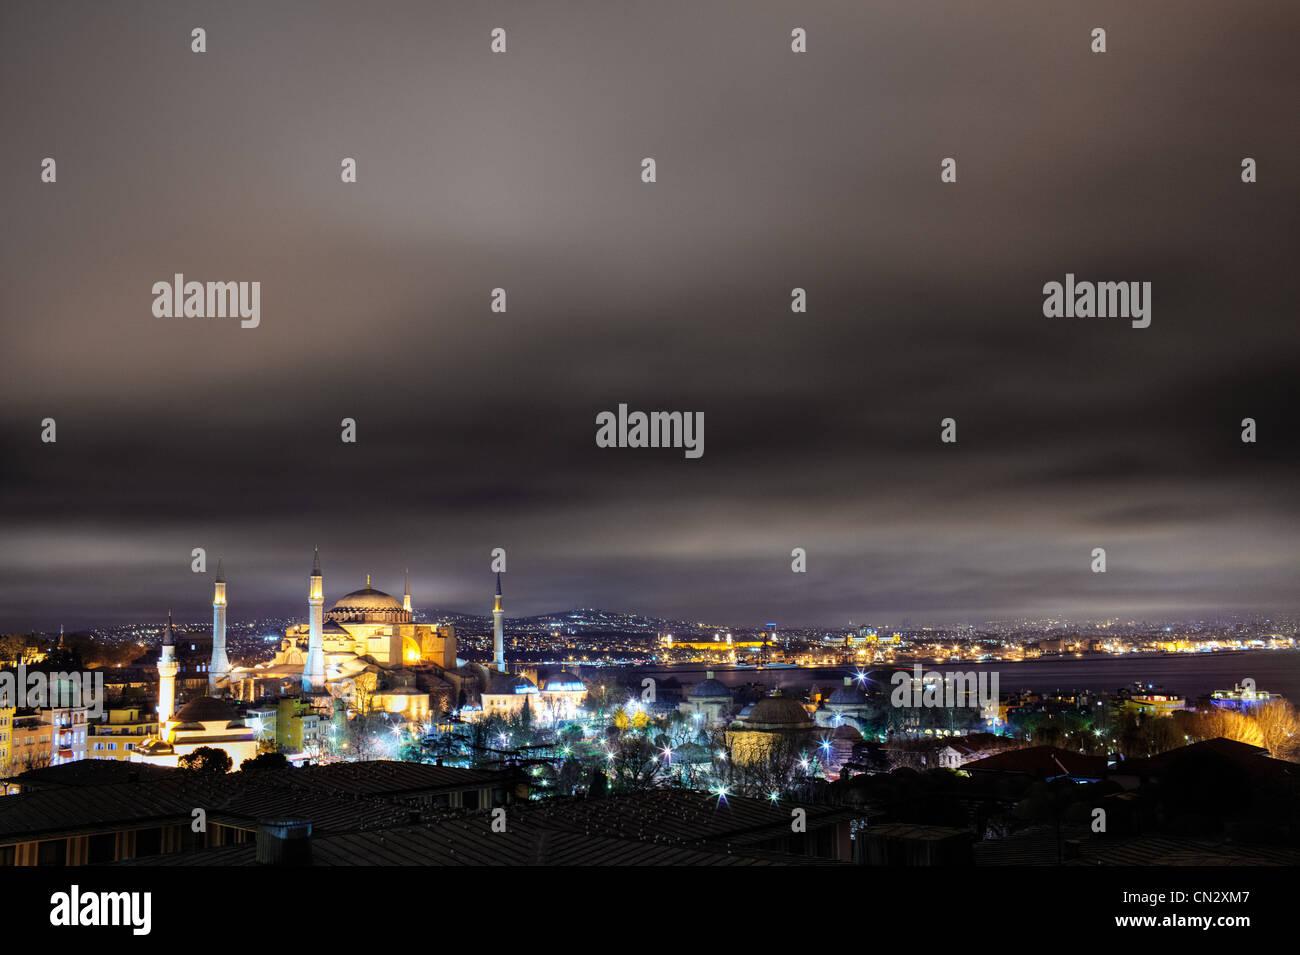 Hagia Sofia mosque at night, Istanbul, Turkey Stock Photo